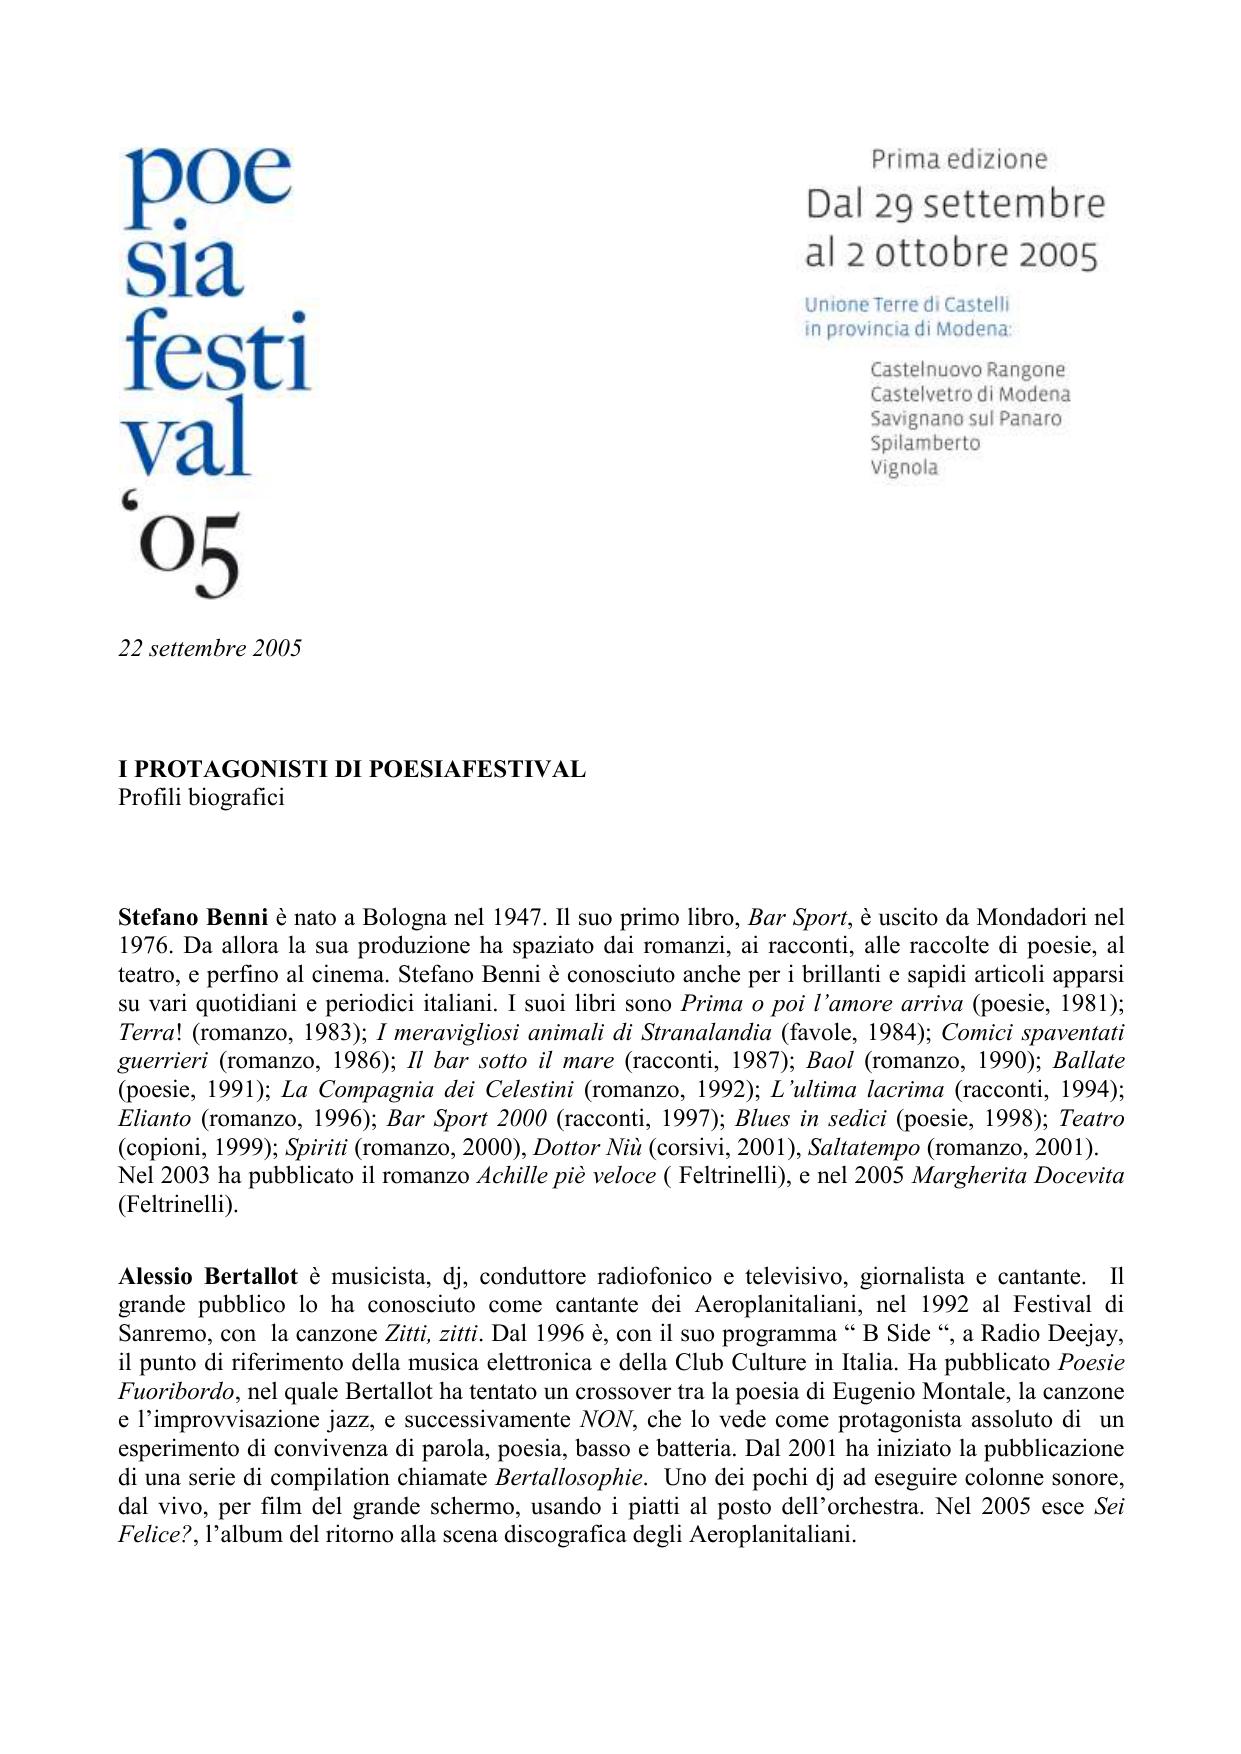 festival poésie trois rivières annuncio incontri roma